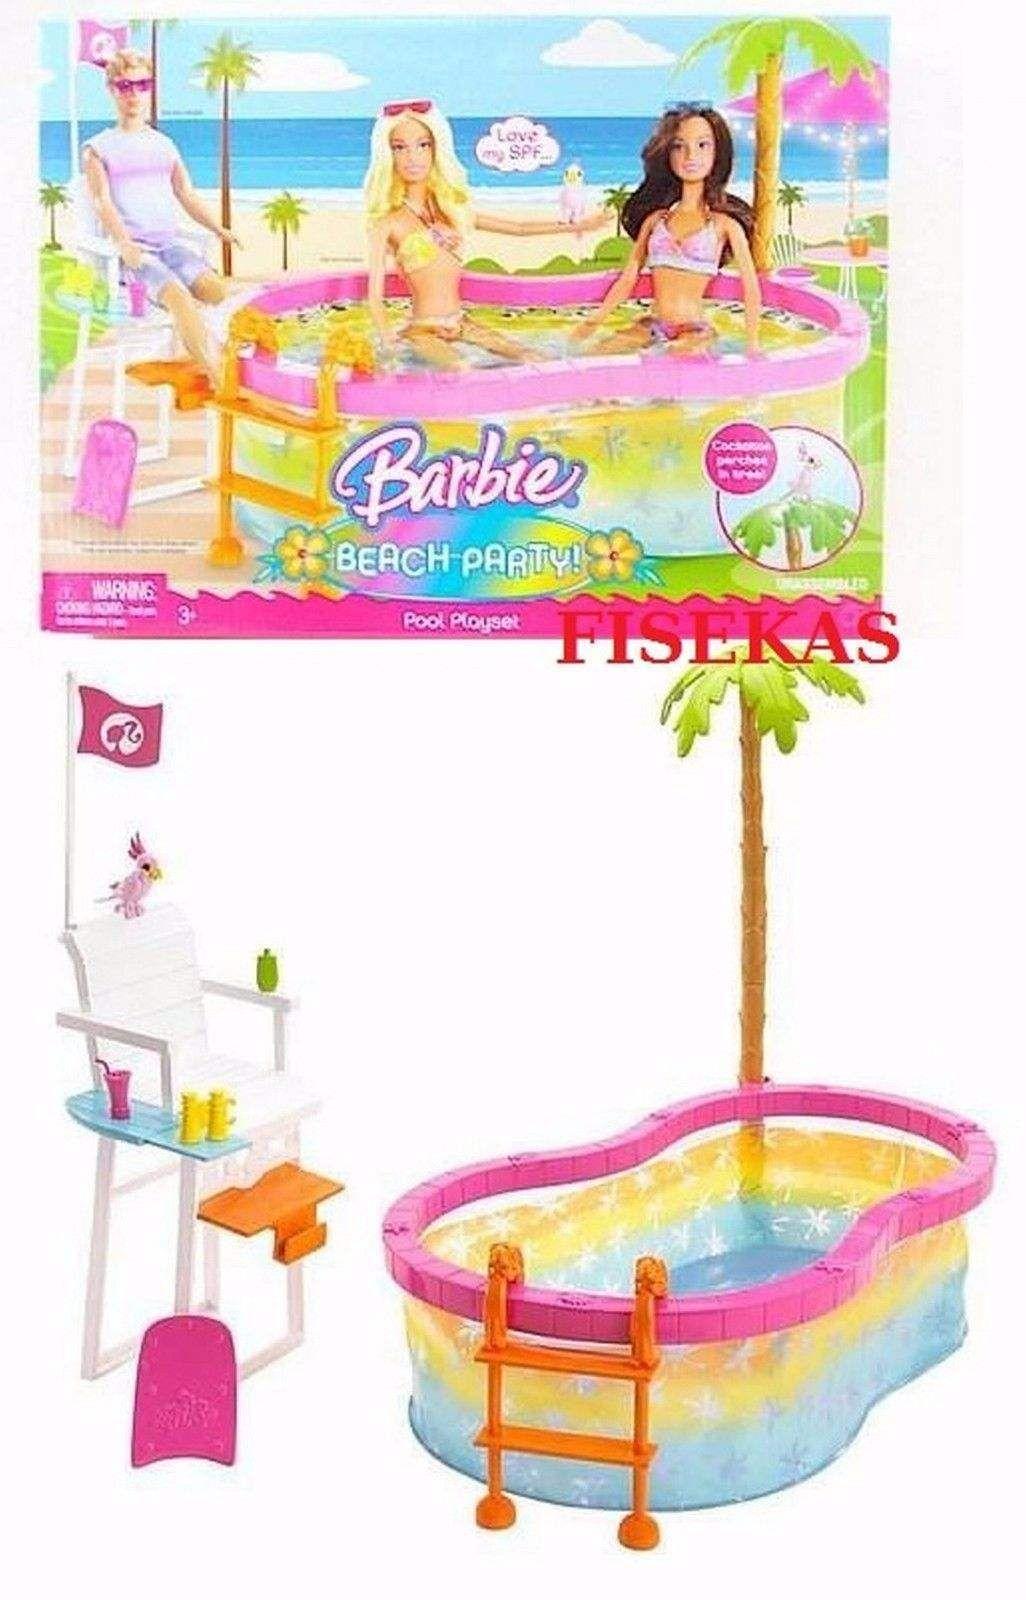 Barbie Beach Party Pool Playset Bird Lifeguard Chair Set 2008 N4949 ...